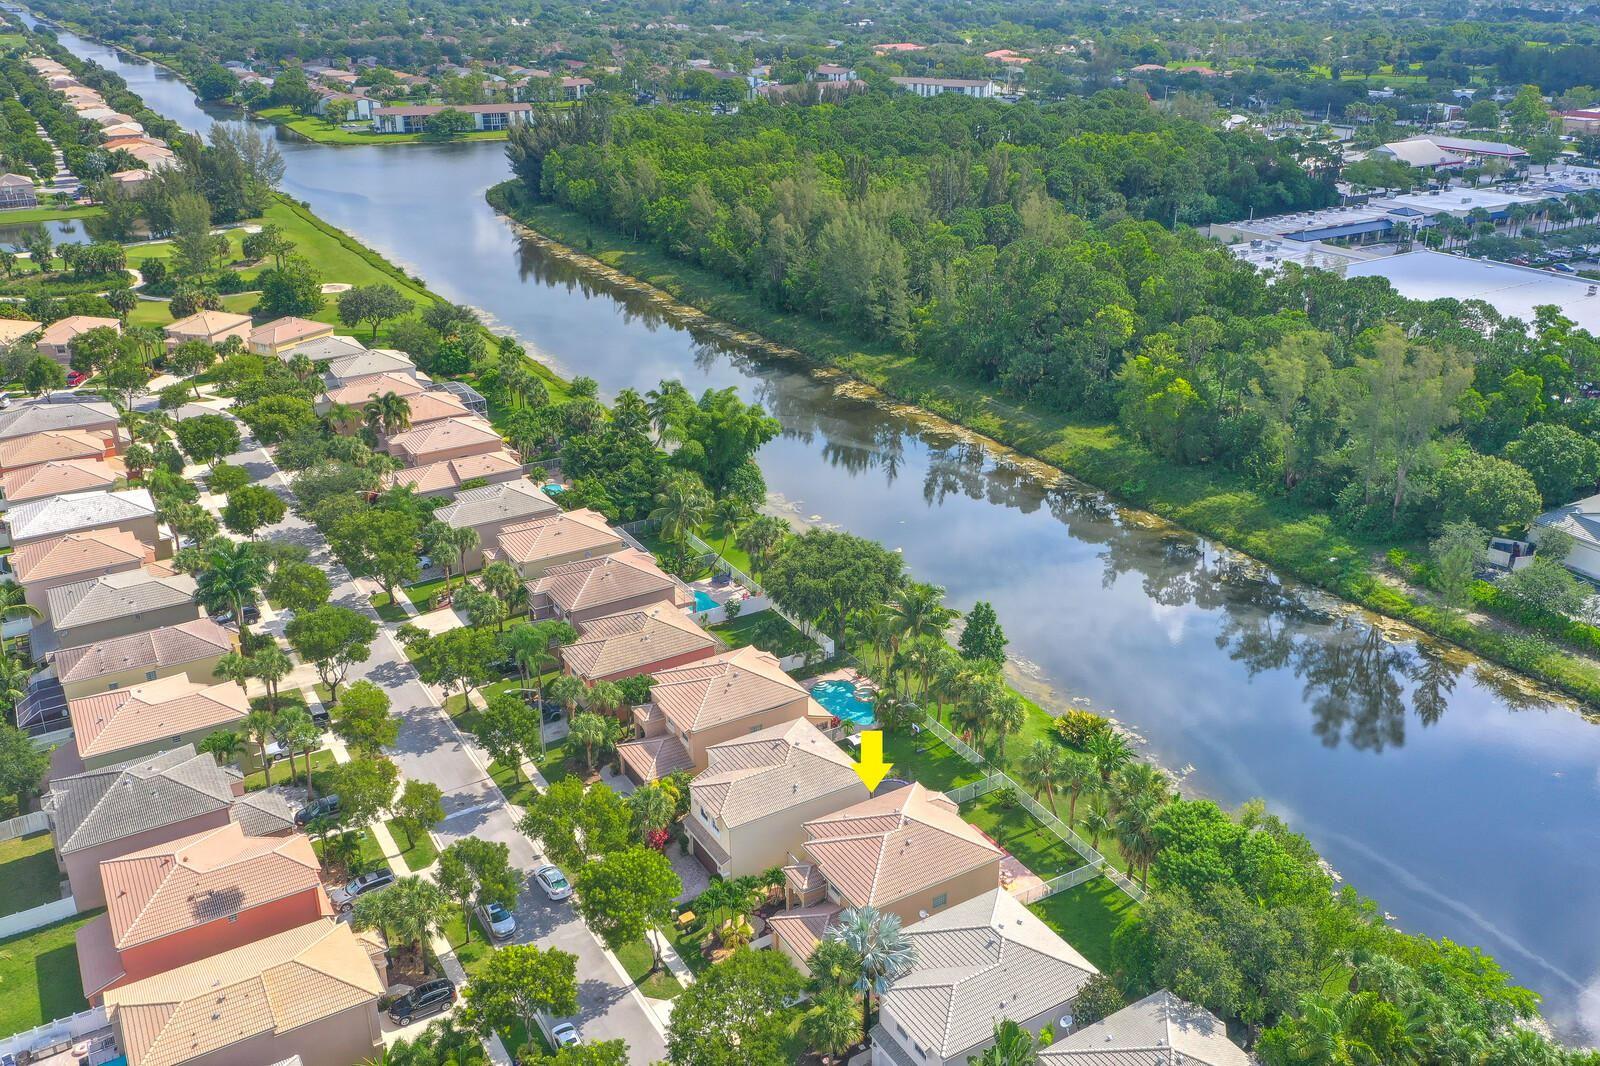 Photo of 1106 Oakwater Drive, Royal Palm Beach, FL 33411 (MLS # RX-10637488)